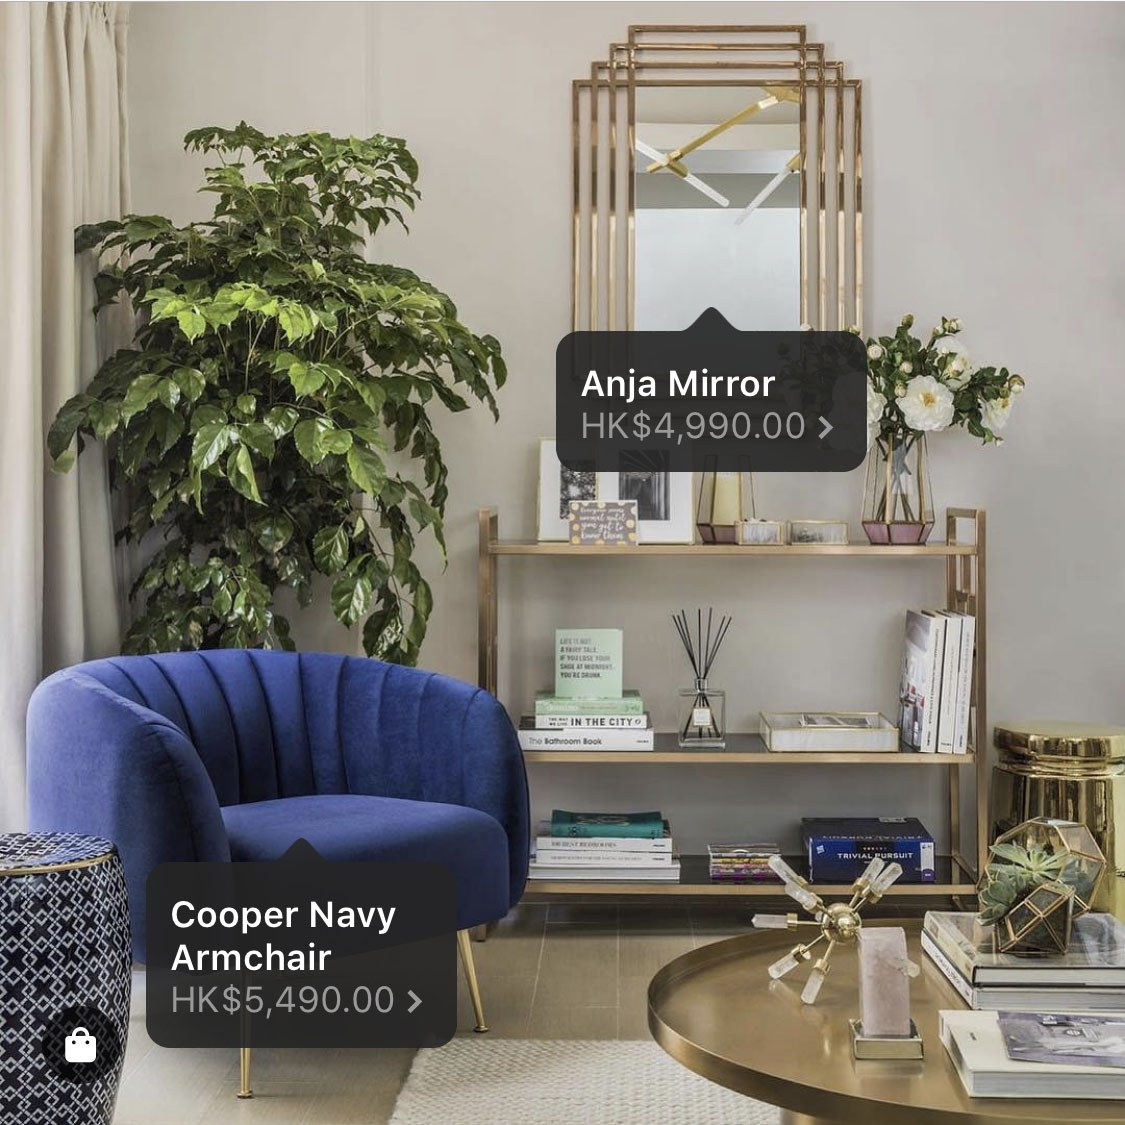 Instagram Shoppable Ads in Hong Kong